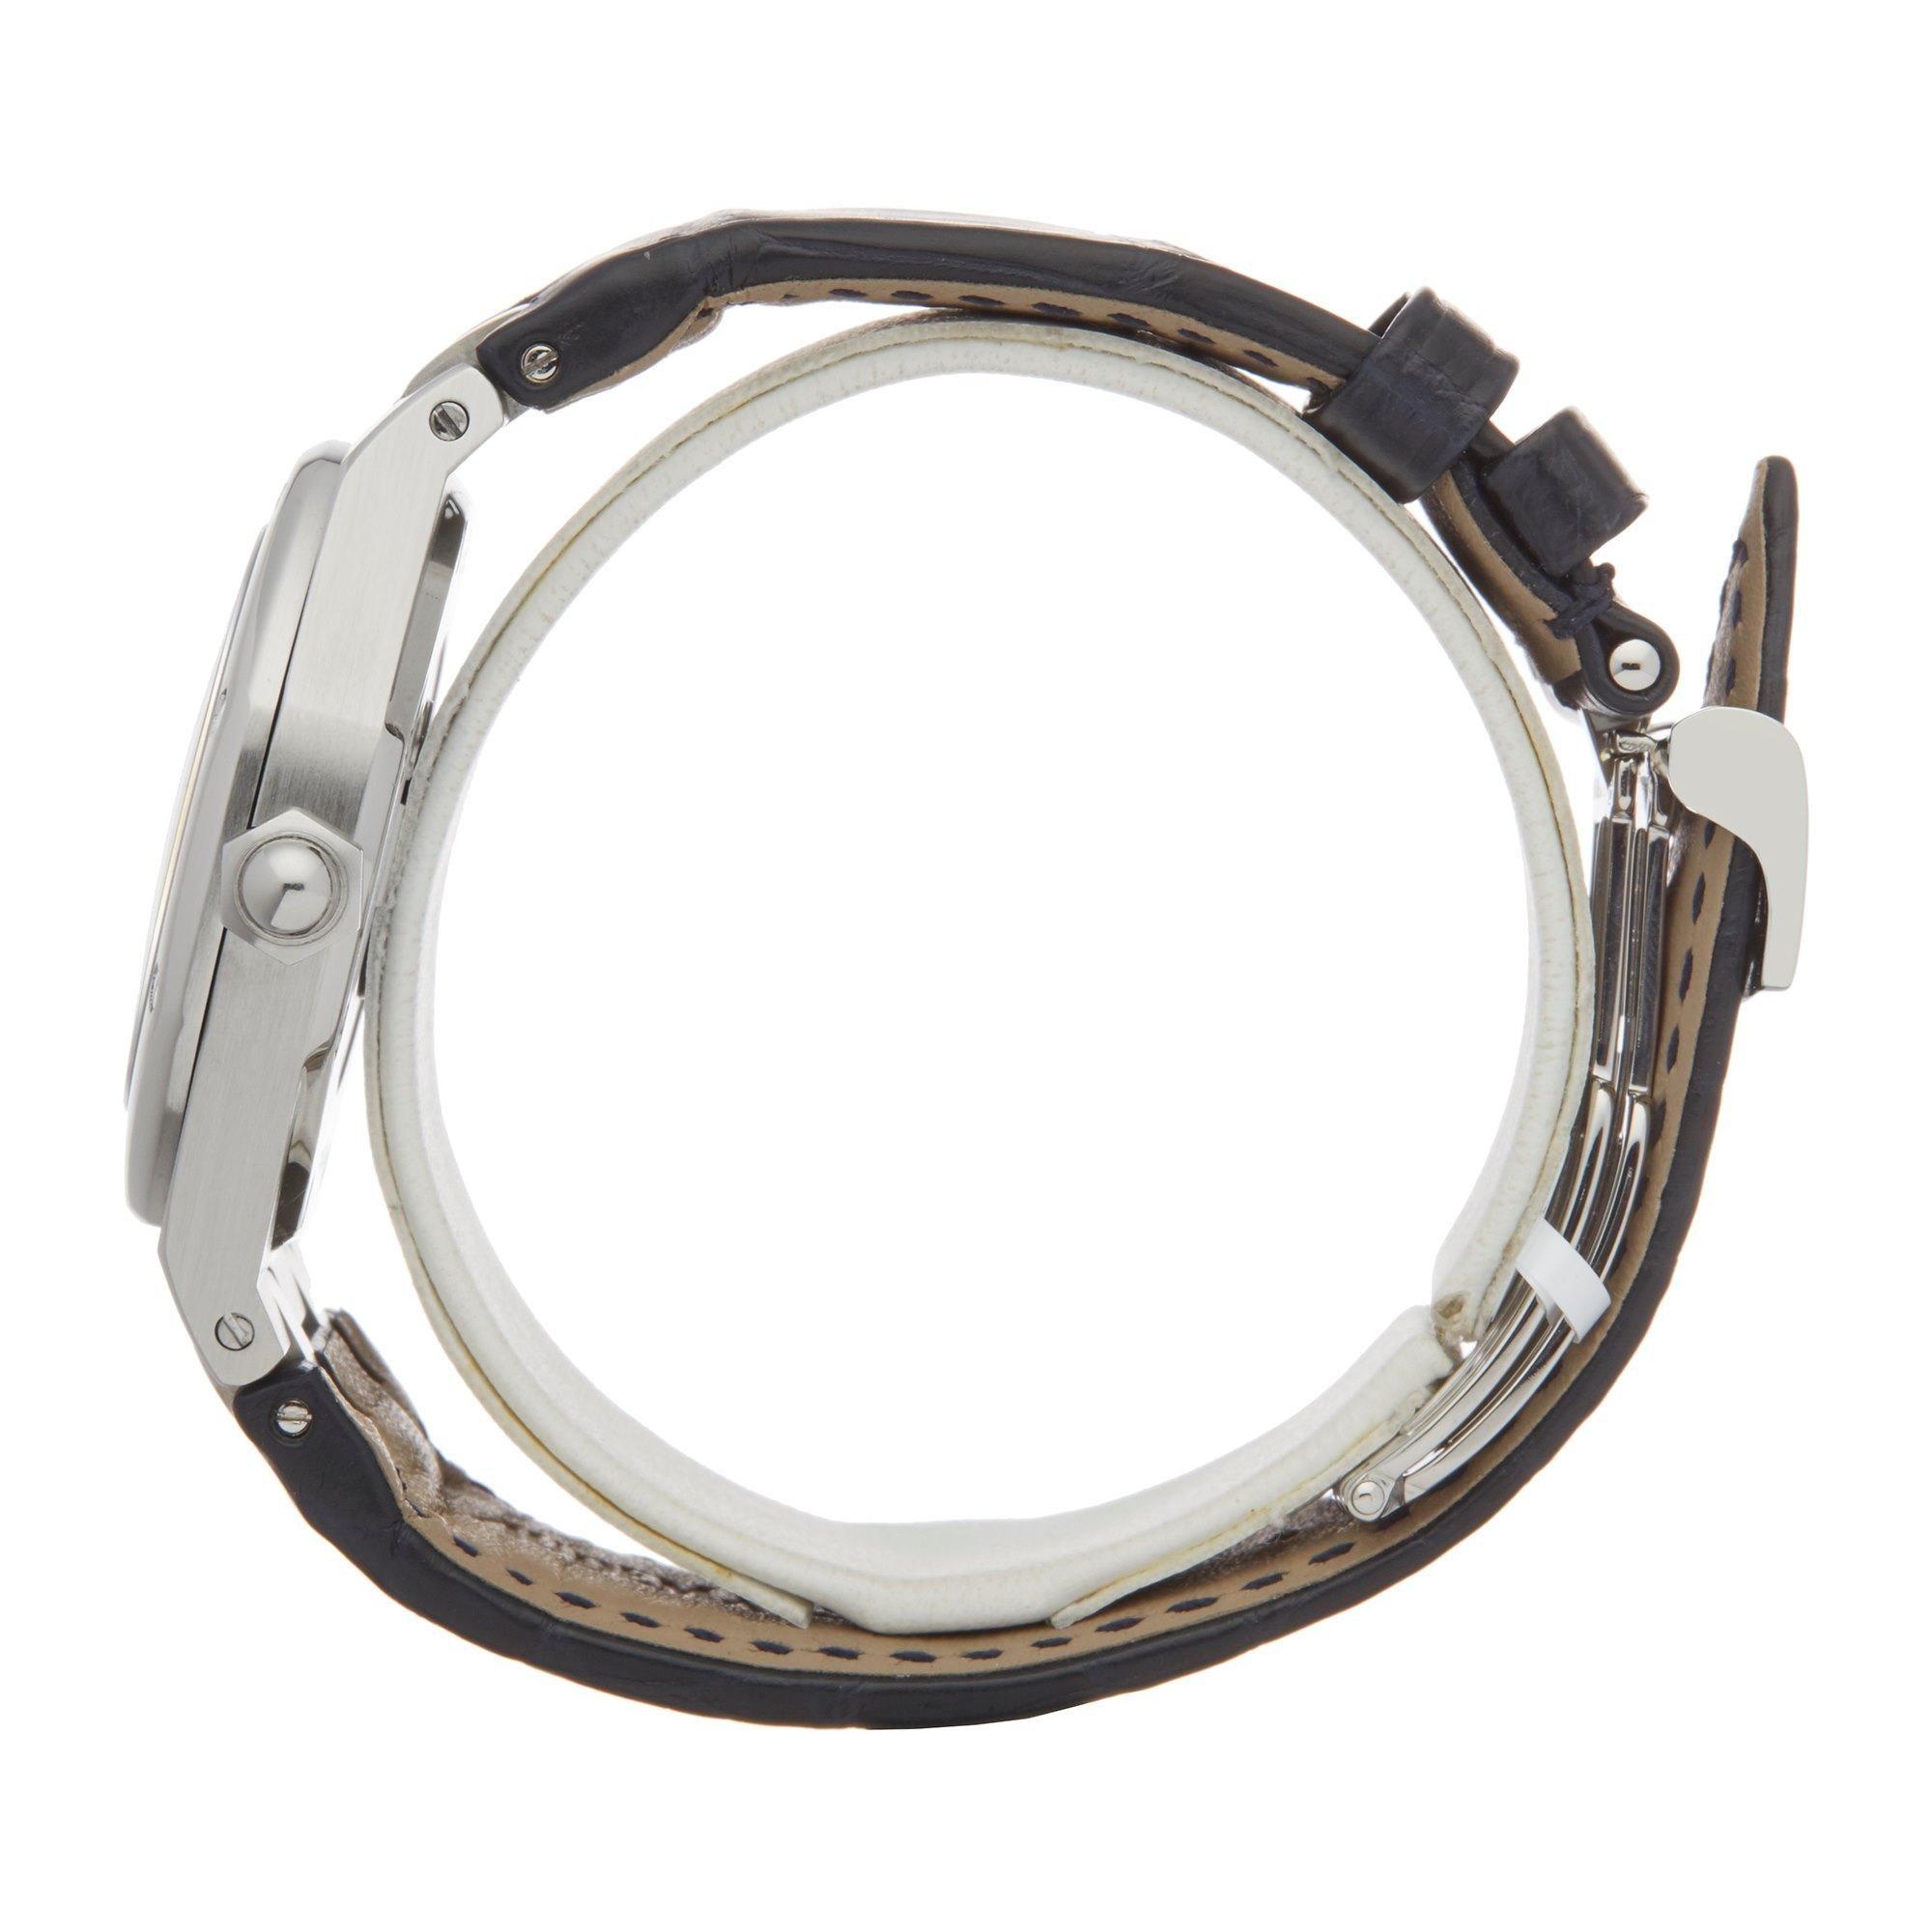 Audemars Piguet Royal Oak Lady Stainless Steel 67600ST